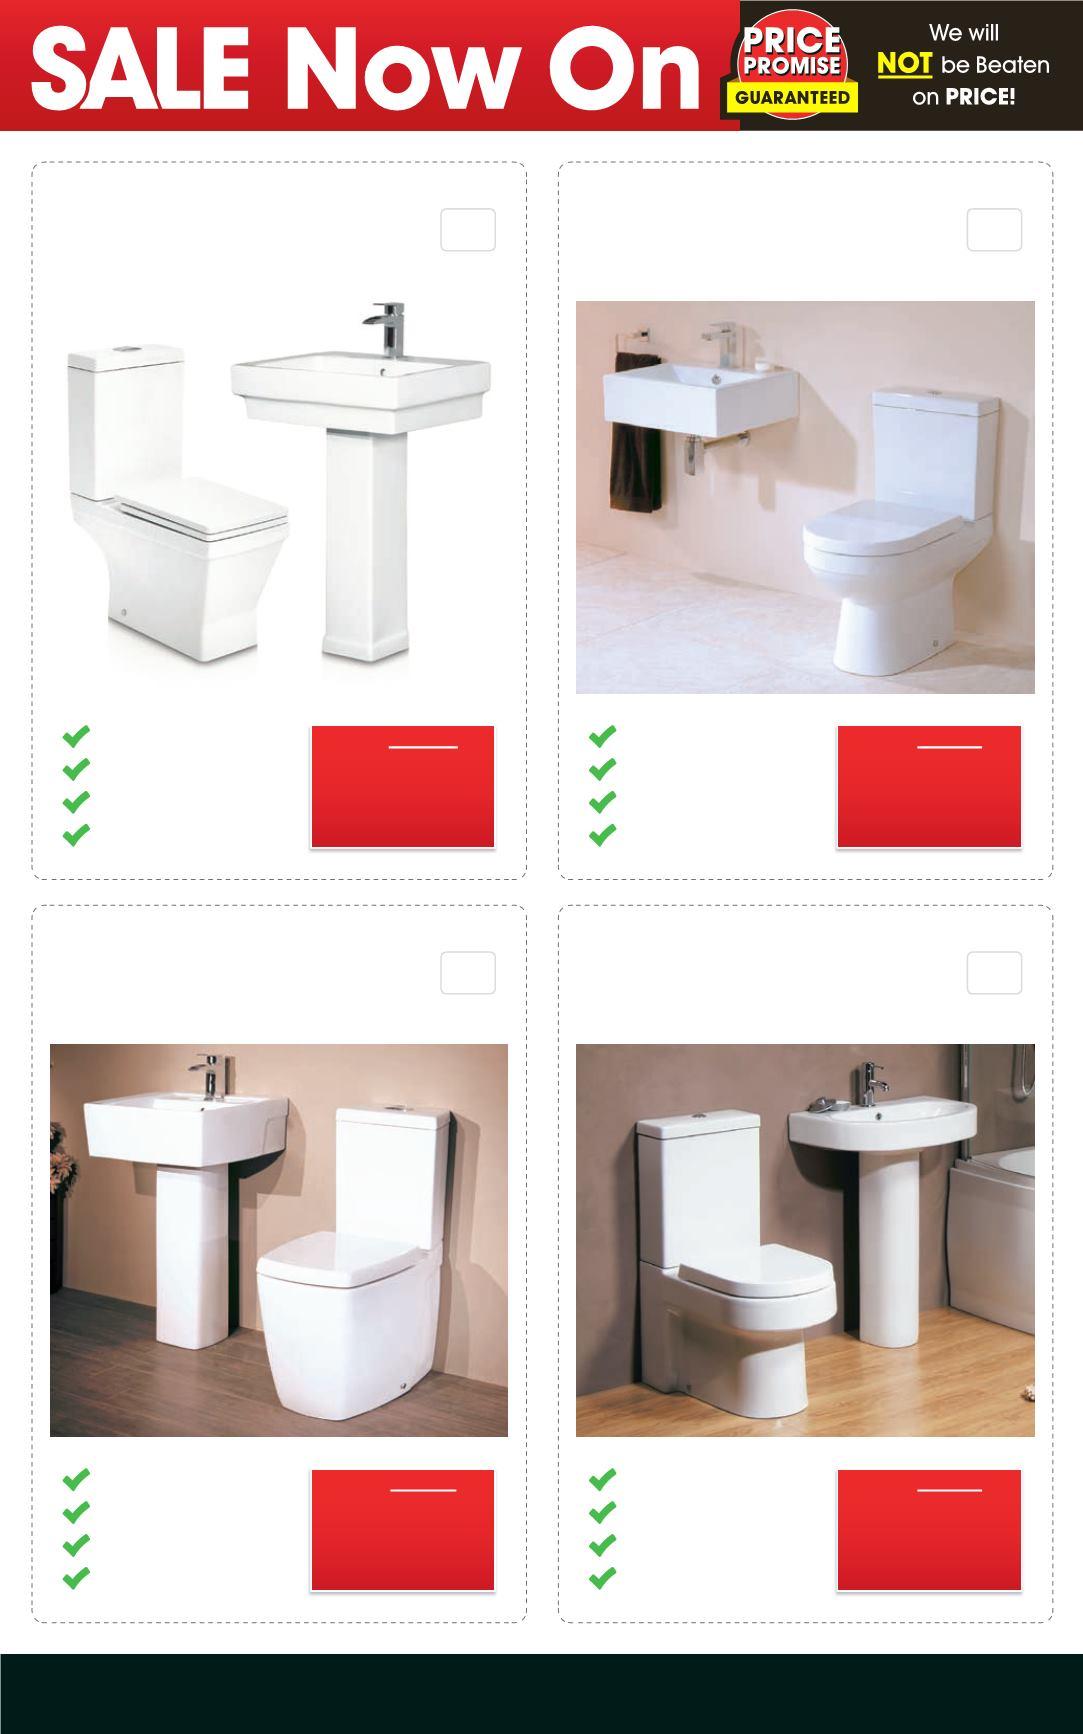 Better bathrooms sale - Better Bathrooms April Showers Sale Deal Sheet Page 3